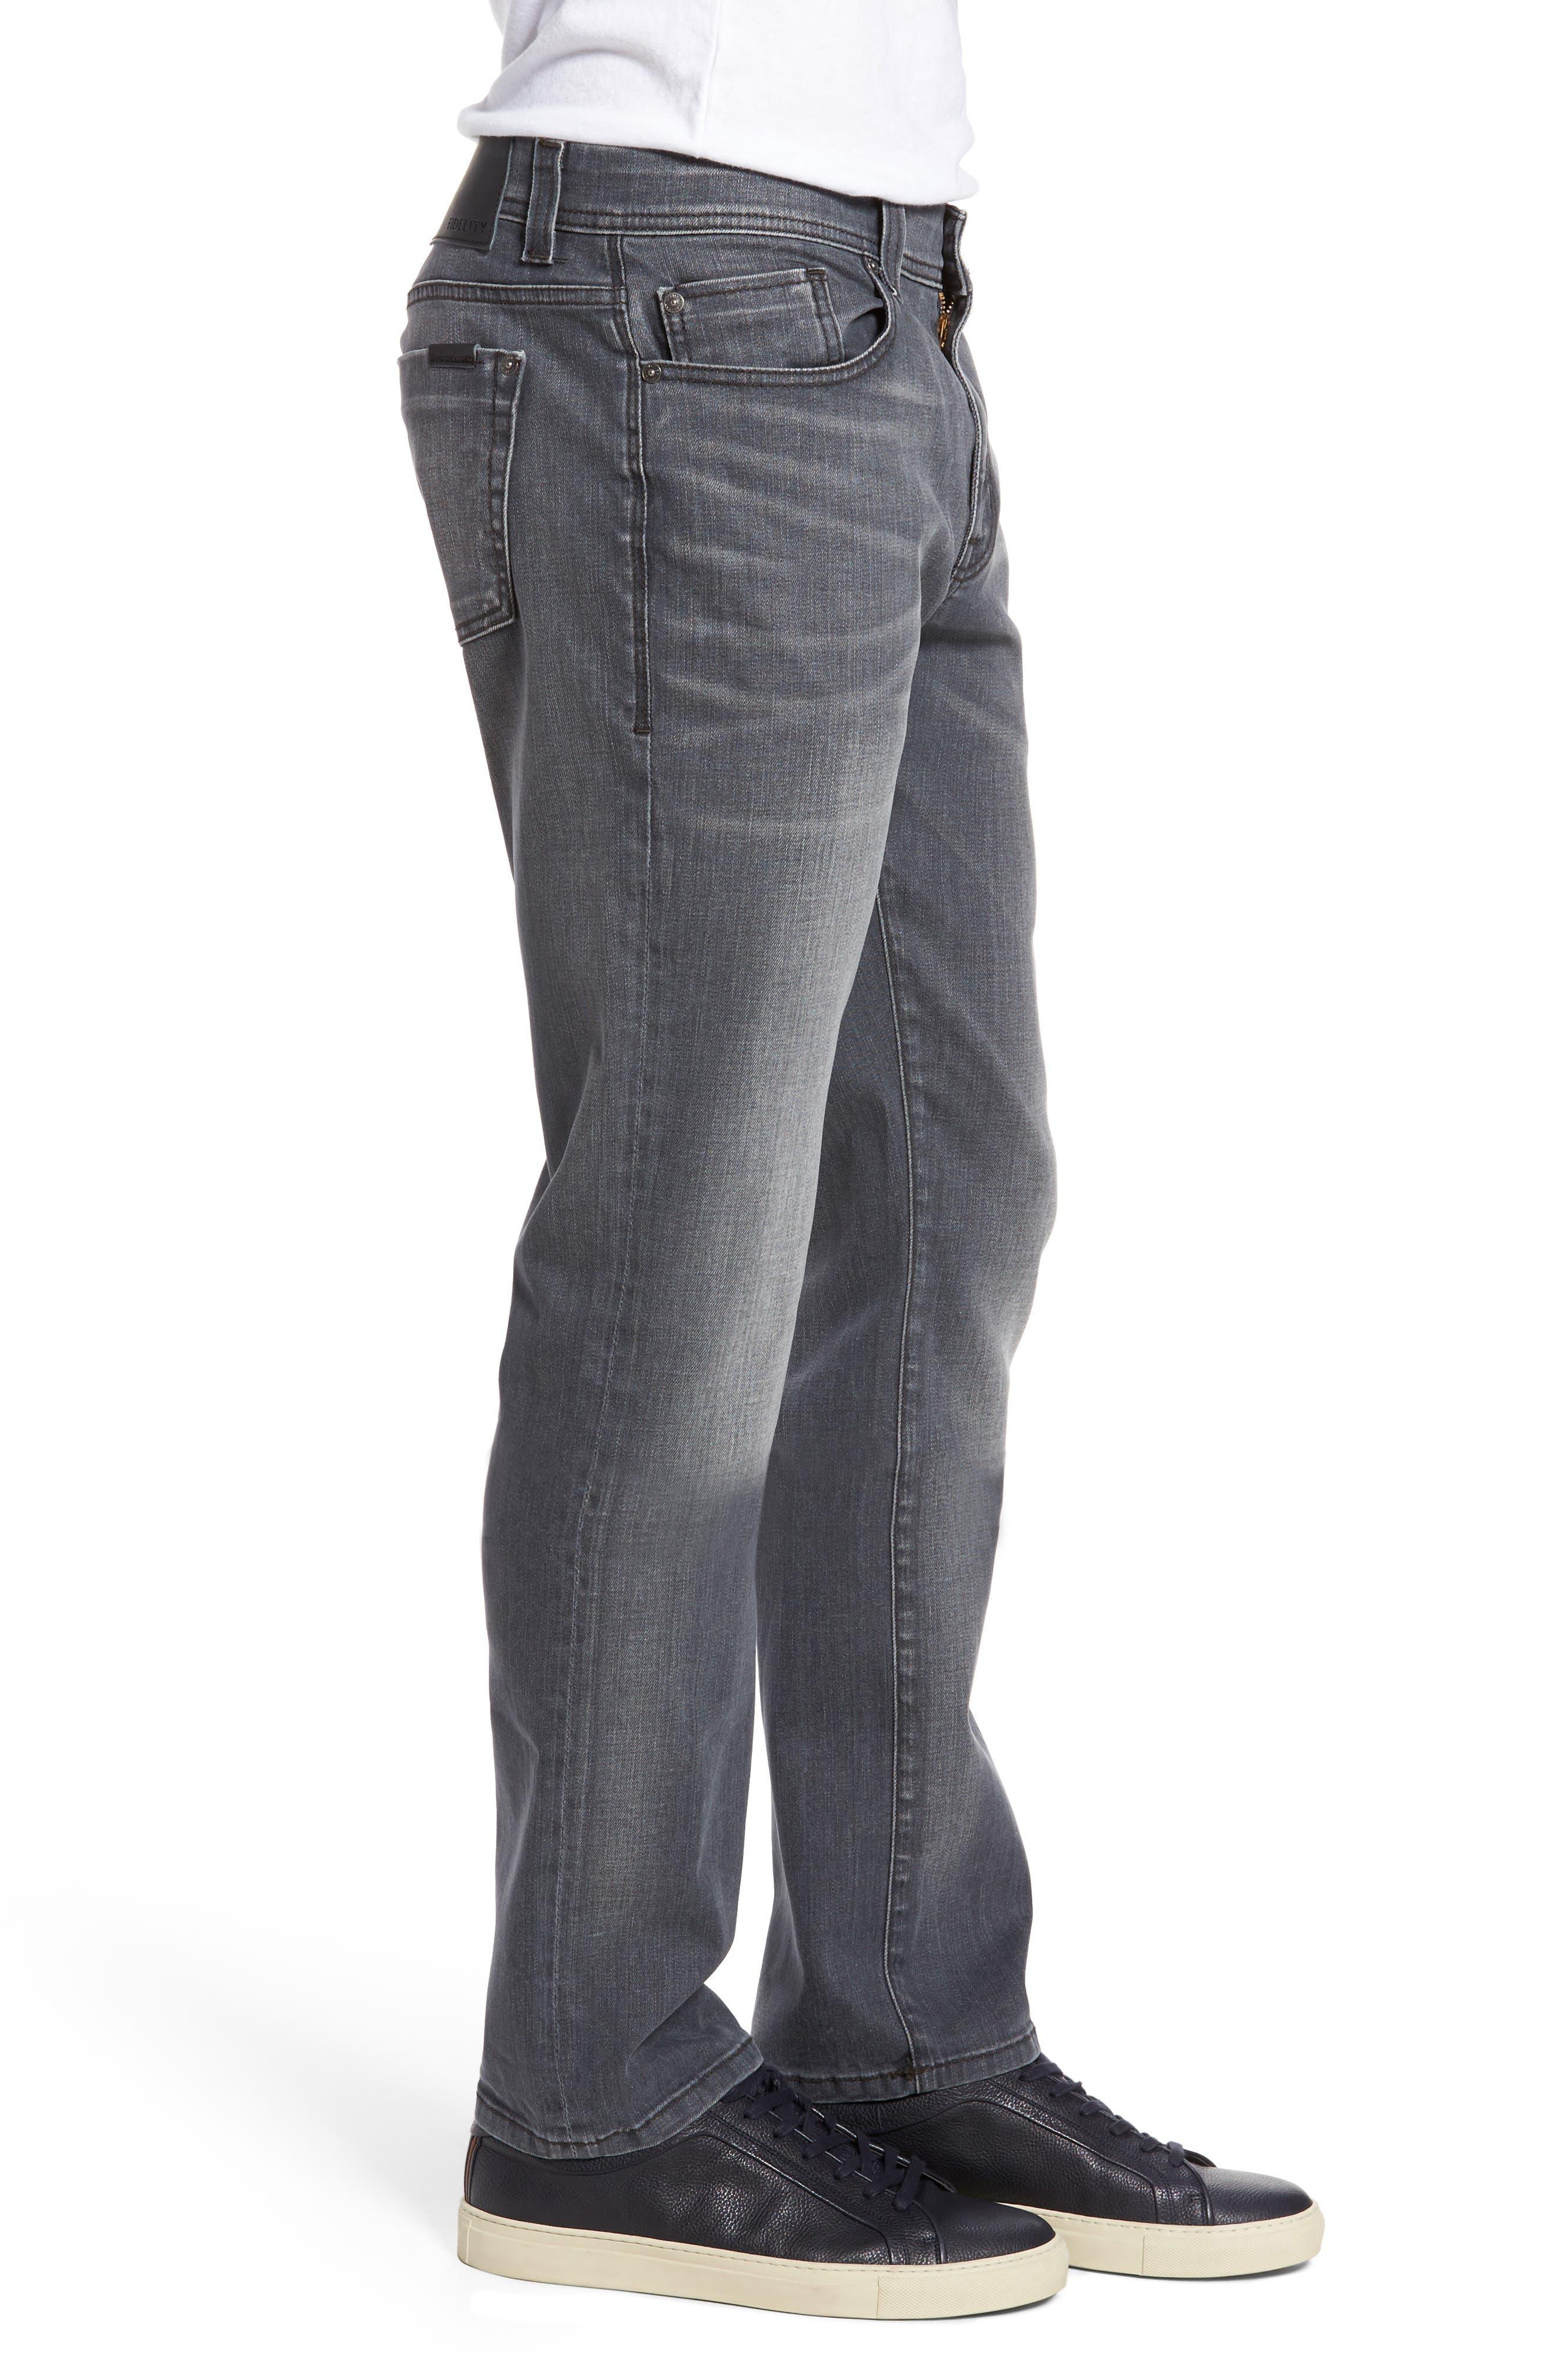 Jimmy Slim Straight Fit Jeans,                             Alternate thumbnail 3, color,                             Steelo Vintage